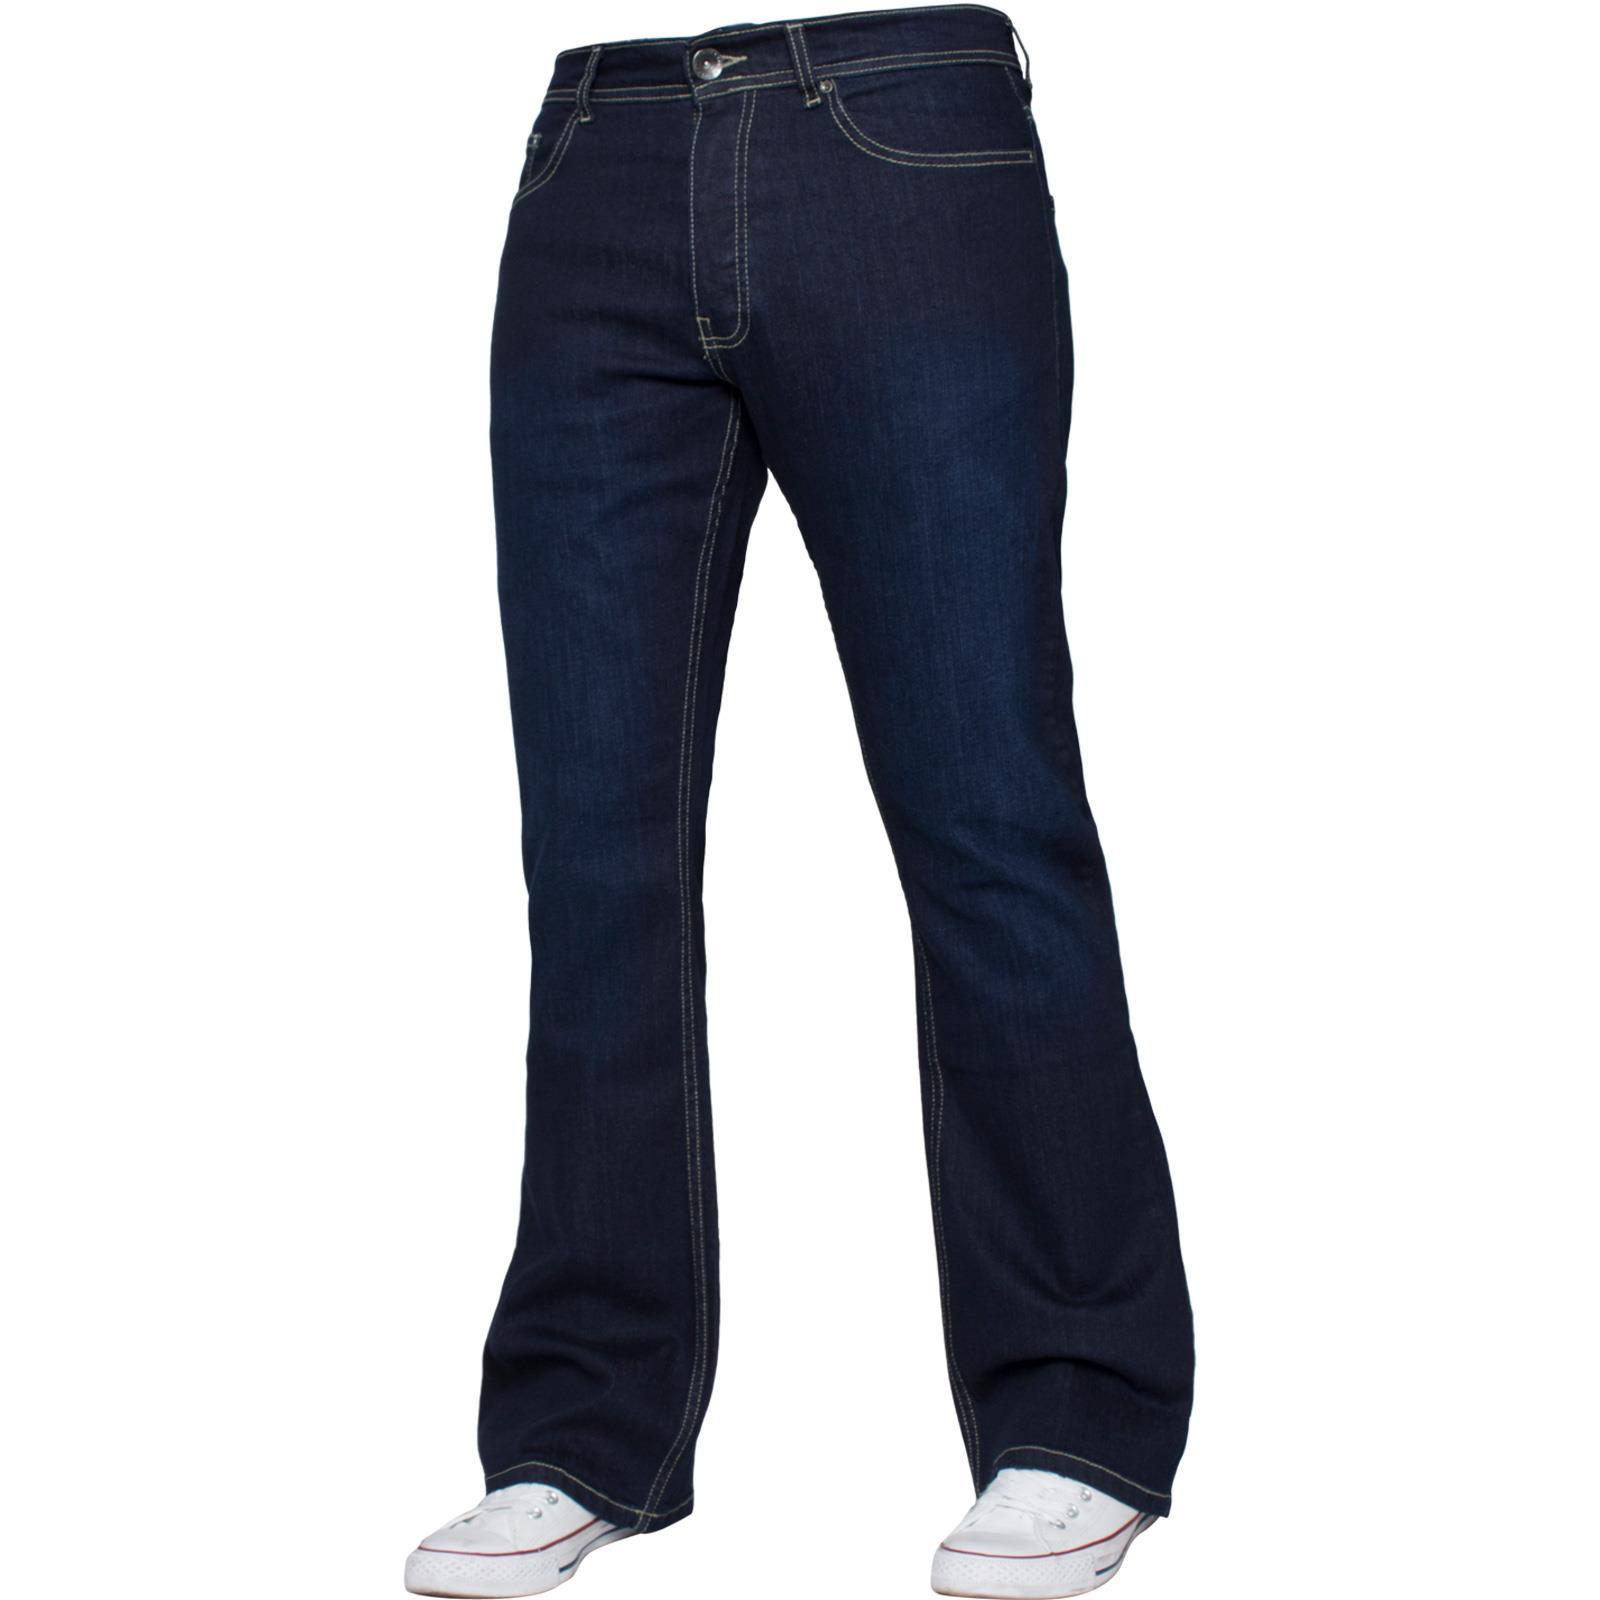 Enzo-Mens-Big-Tall-Jeans-Leg-King-Size-Denim-Pants-Chino-Trousers-Pants-44-034-60-034 thumbnail 103